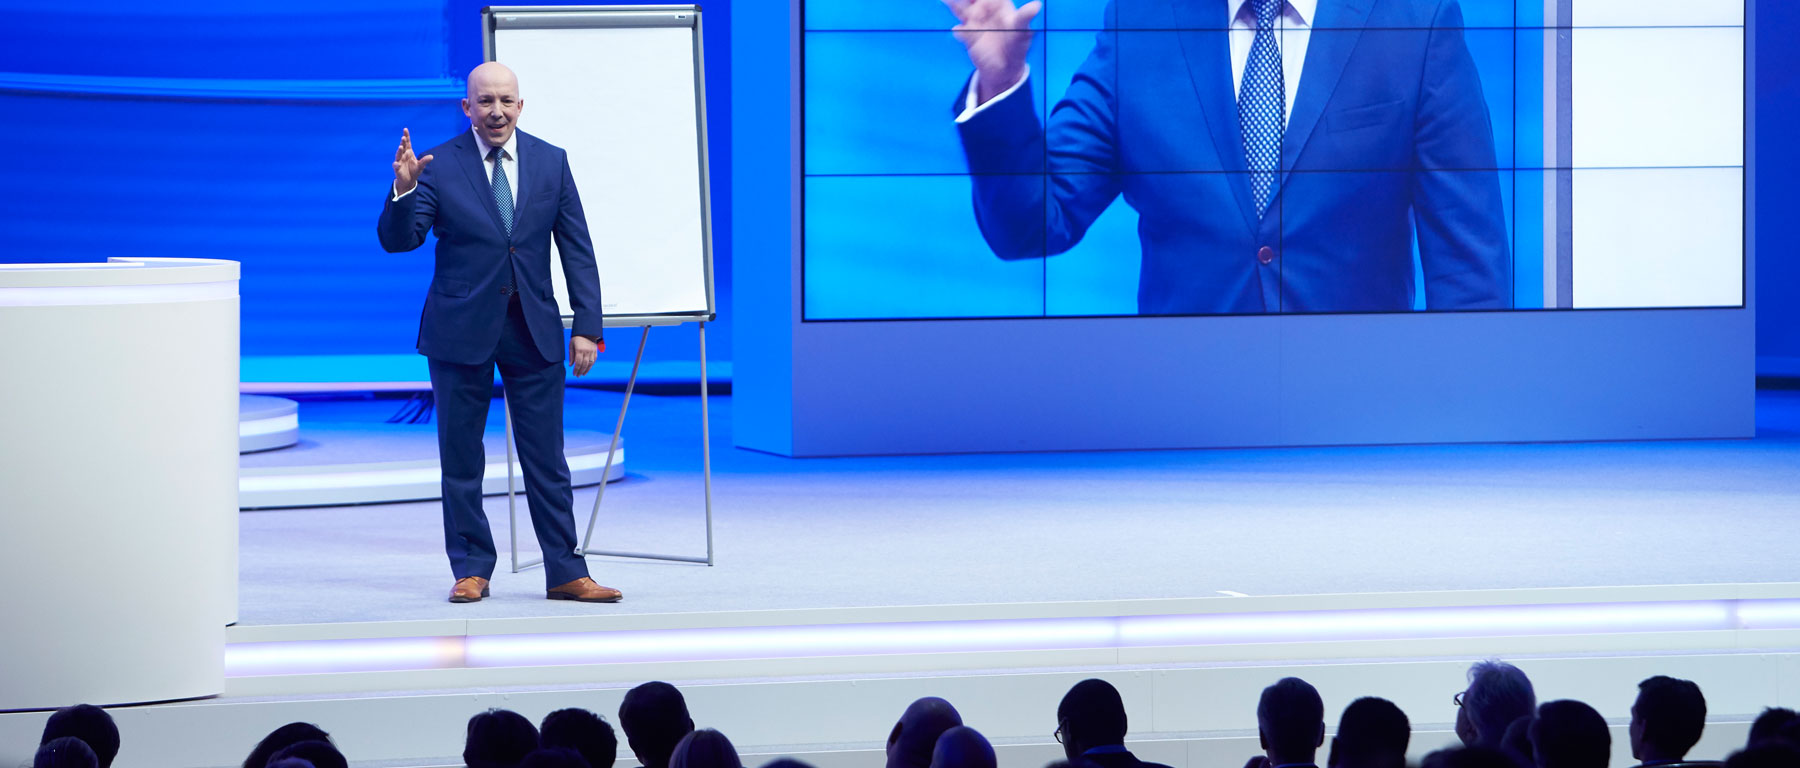 Keynote Speaker - Veit Etzold